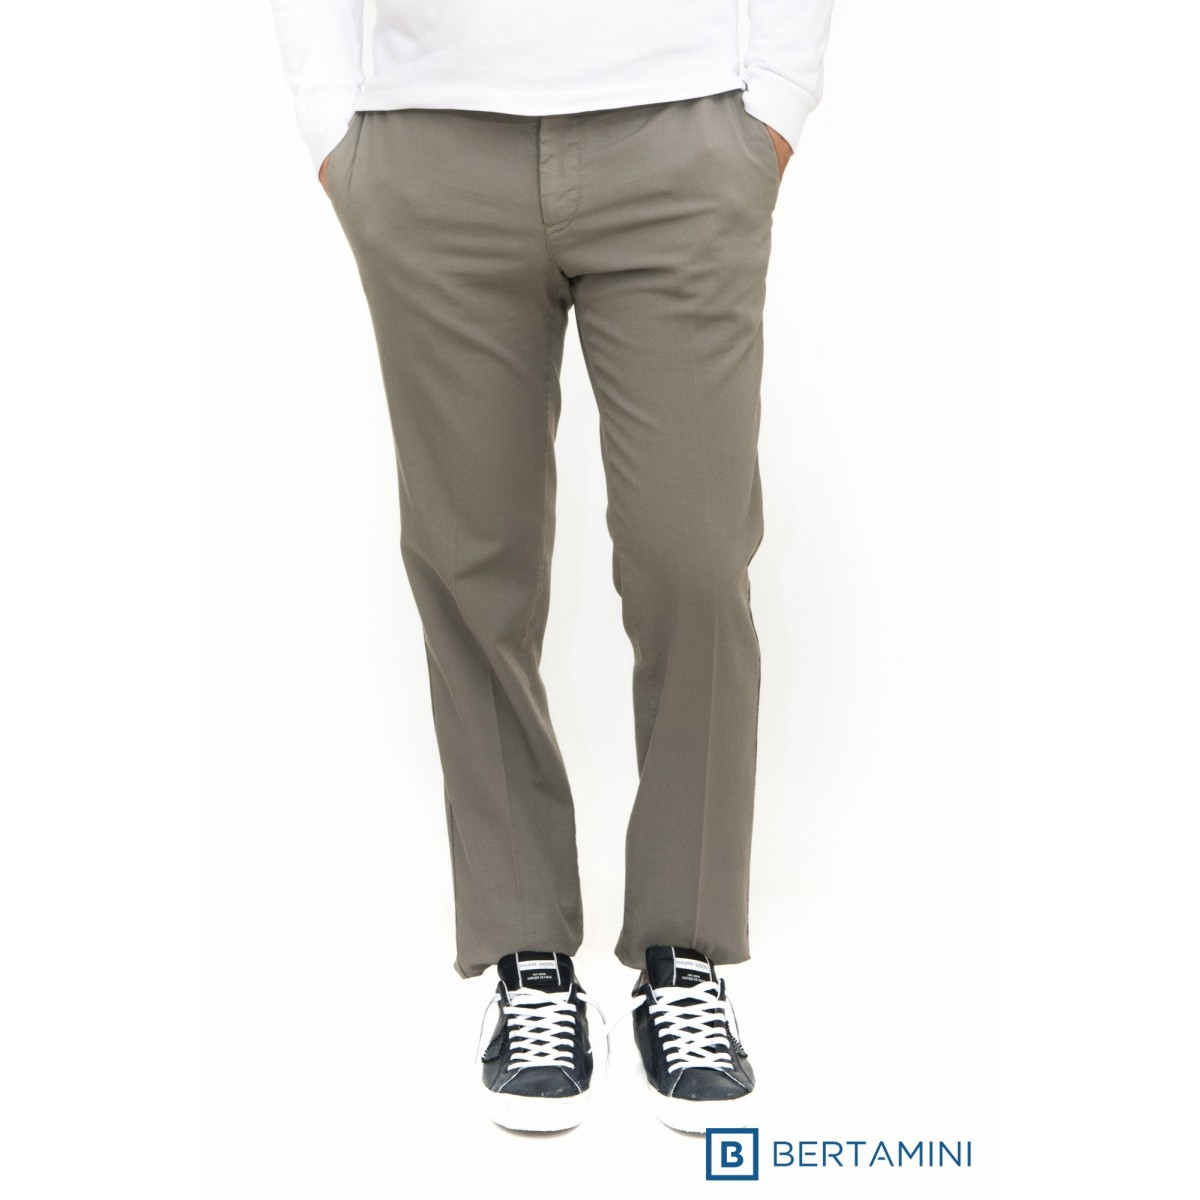 Pantalone Uomo Pt 01 - Cpvtal Sr10 Canvas Cotone Strech Slim